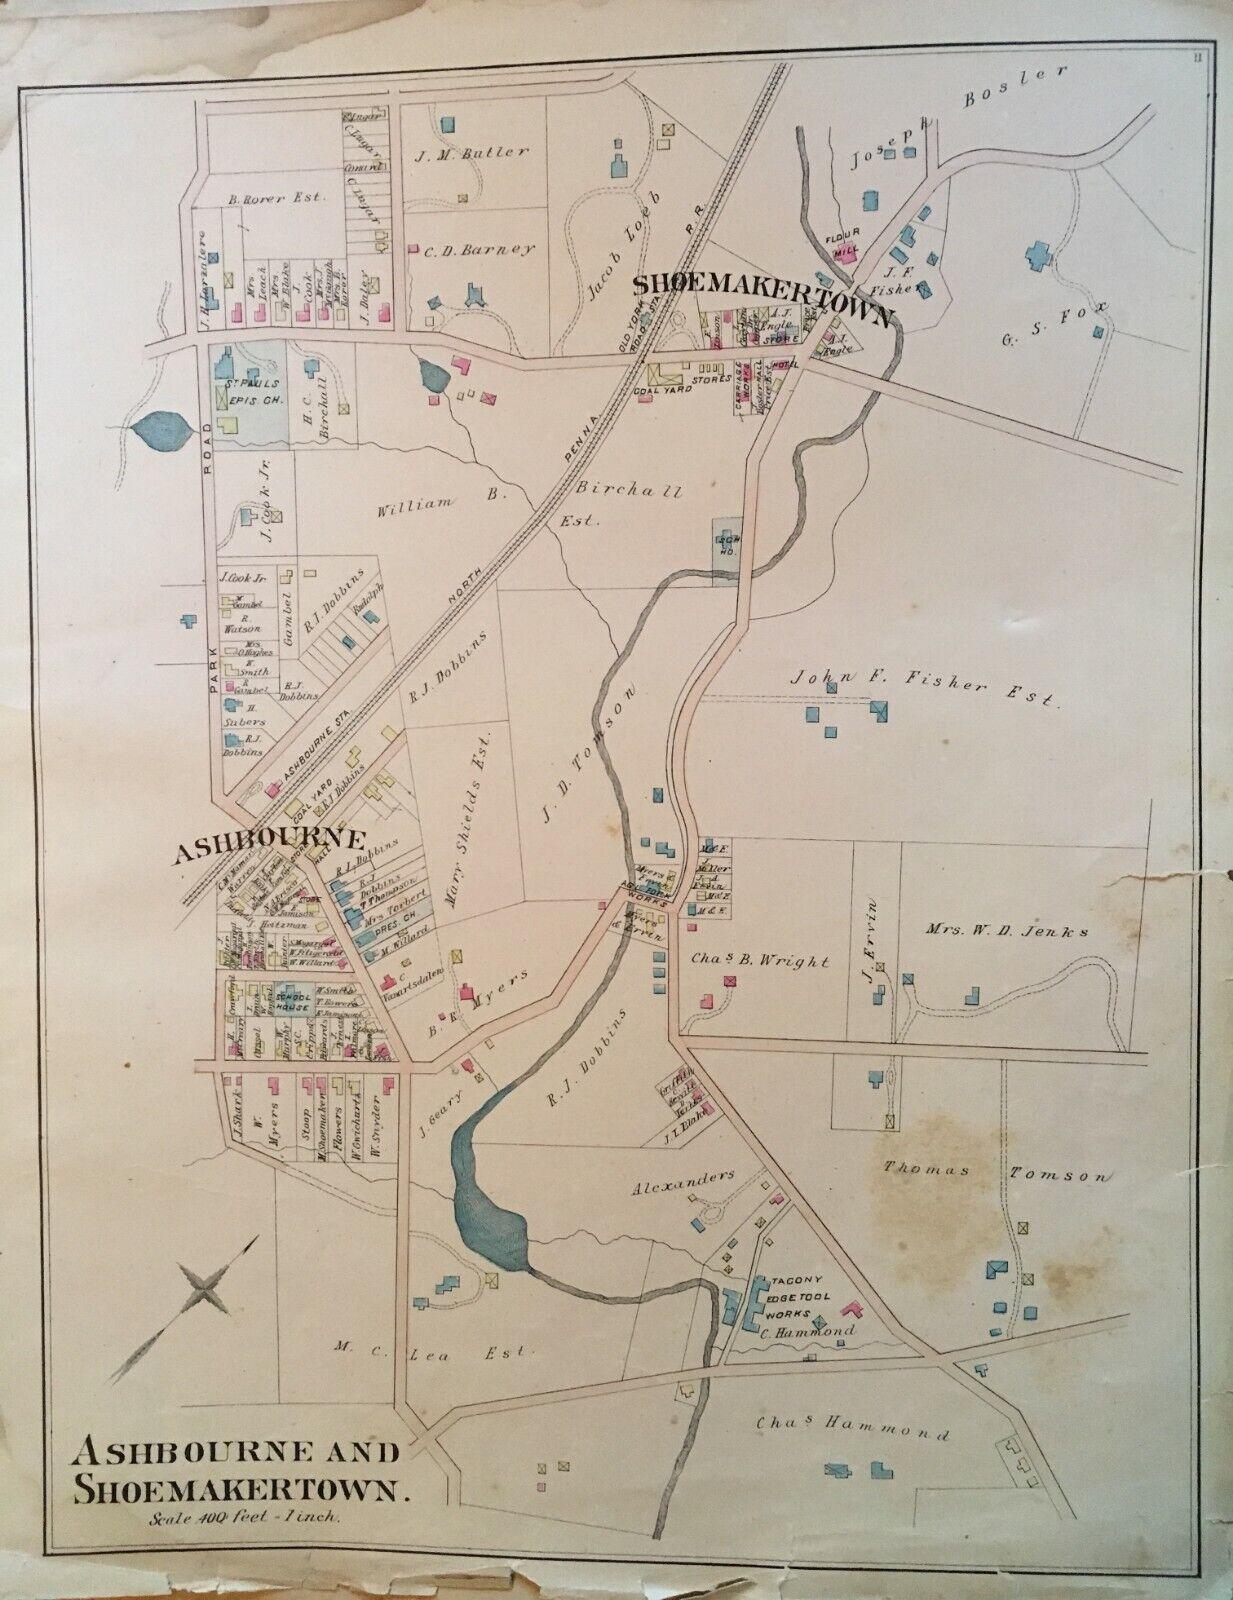 1886 ASHBOURNE schuheMAKERTOWN PHILADELPHIA PA ST. PAULS CHURCH ATLAS MAP